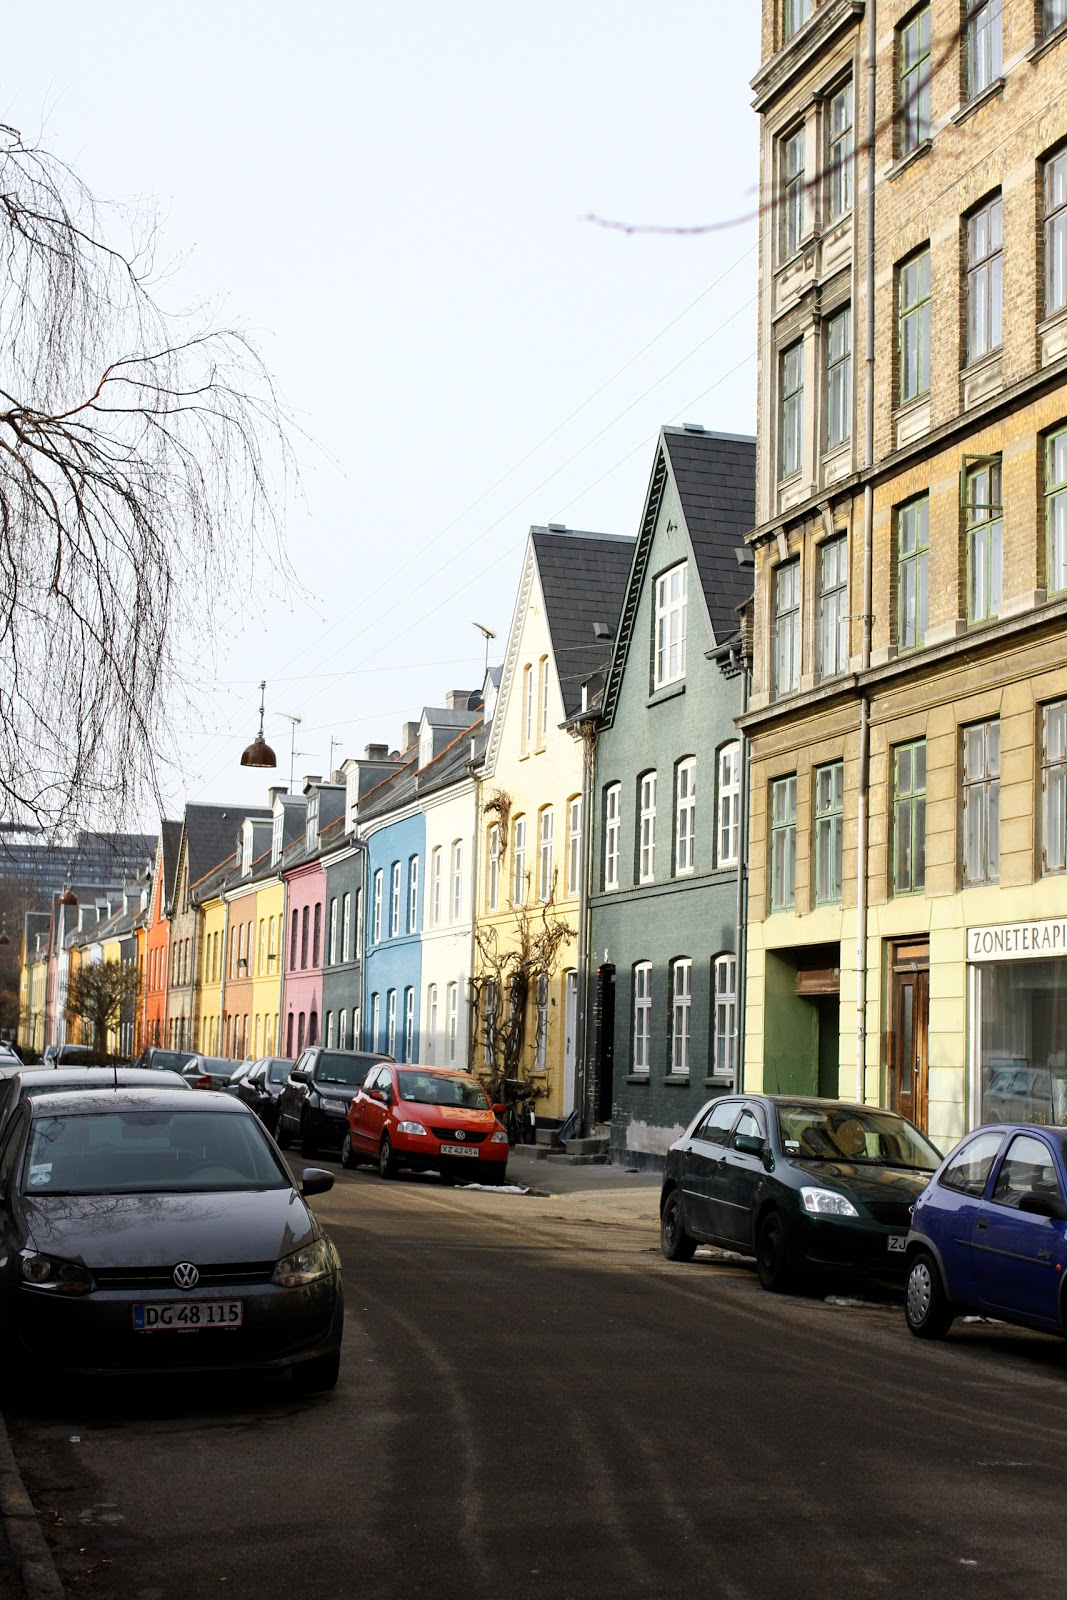 Visiting Europe by way of Reykjavik